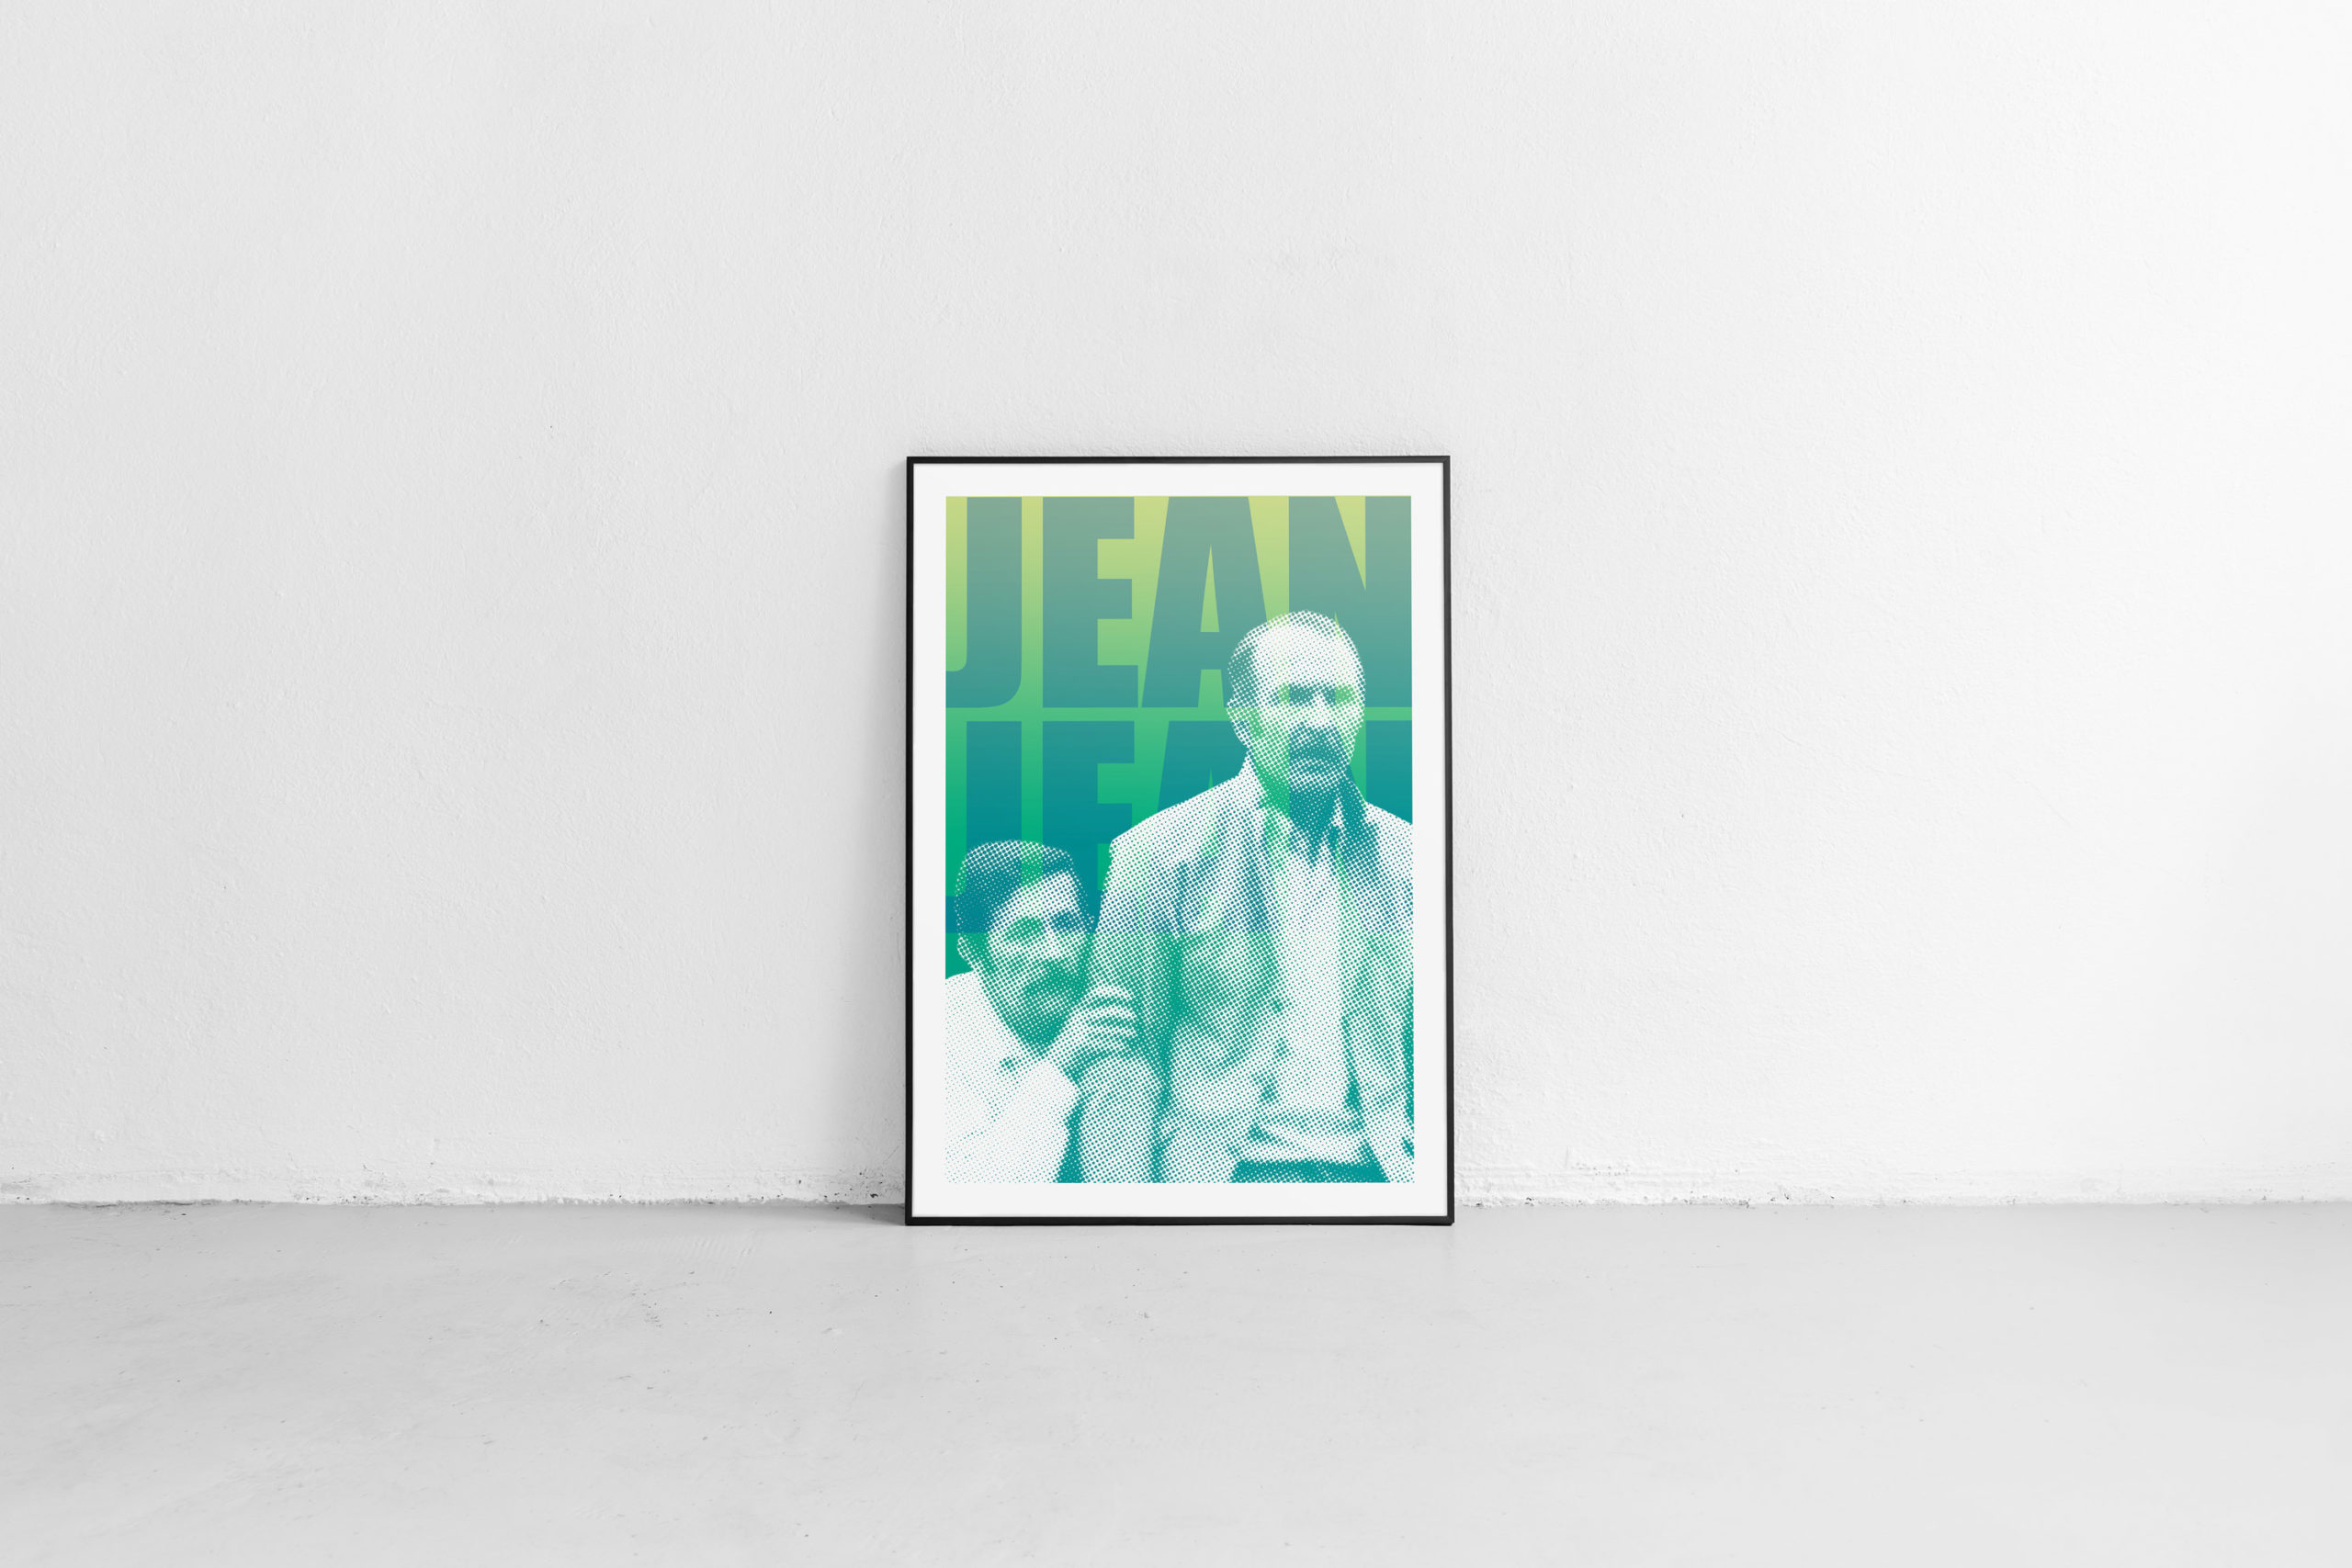 Poster-jeanjean-rochefort-marielle